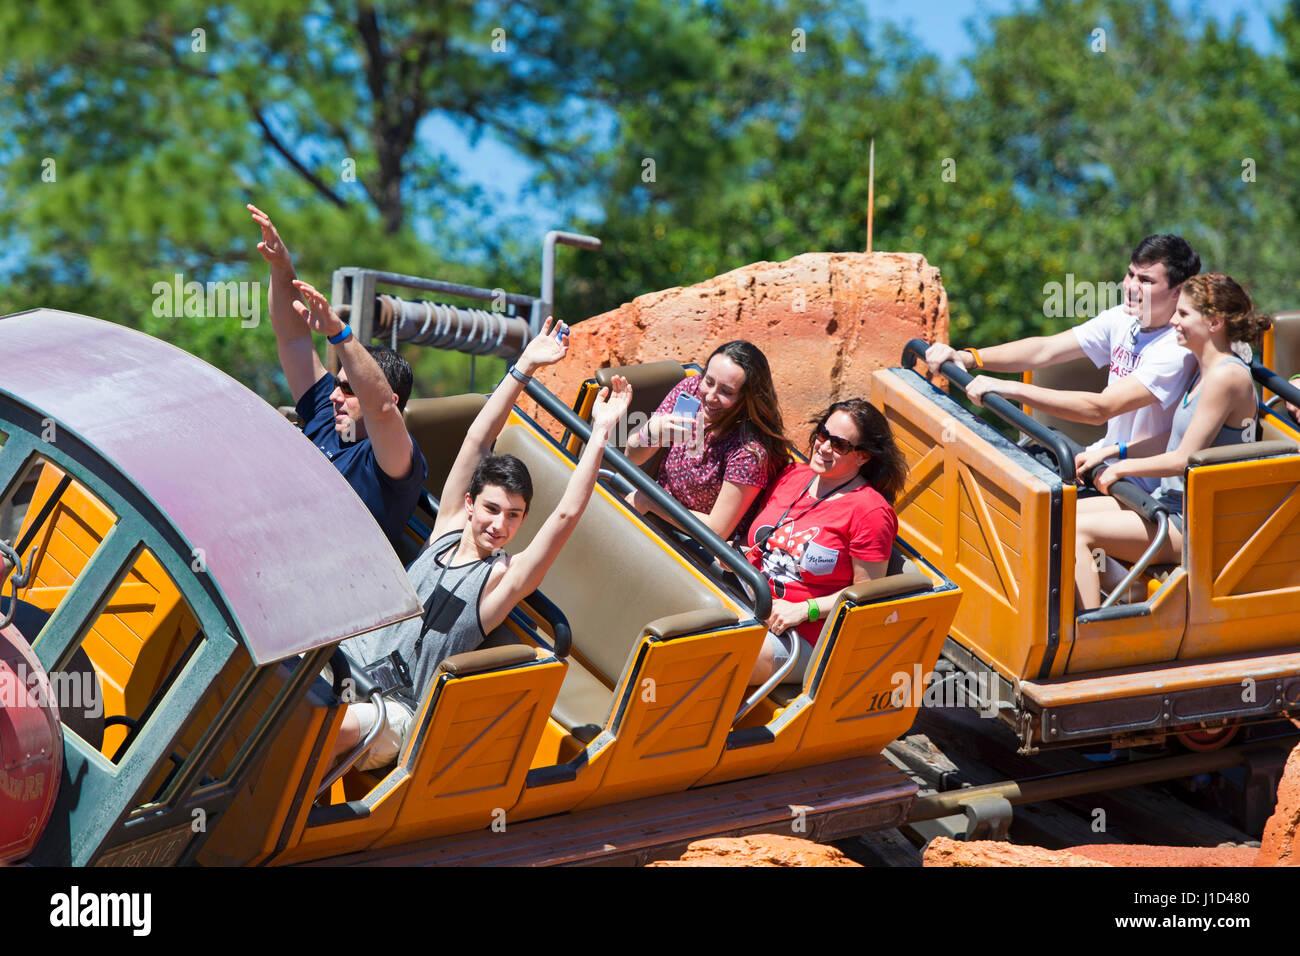 Disney Ride Rides, Big Thunder Mountain Railroad, Disney World, Orlando  Florida - Stock Image